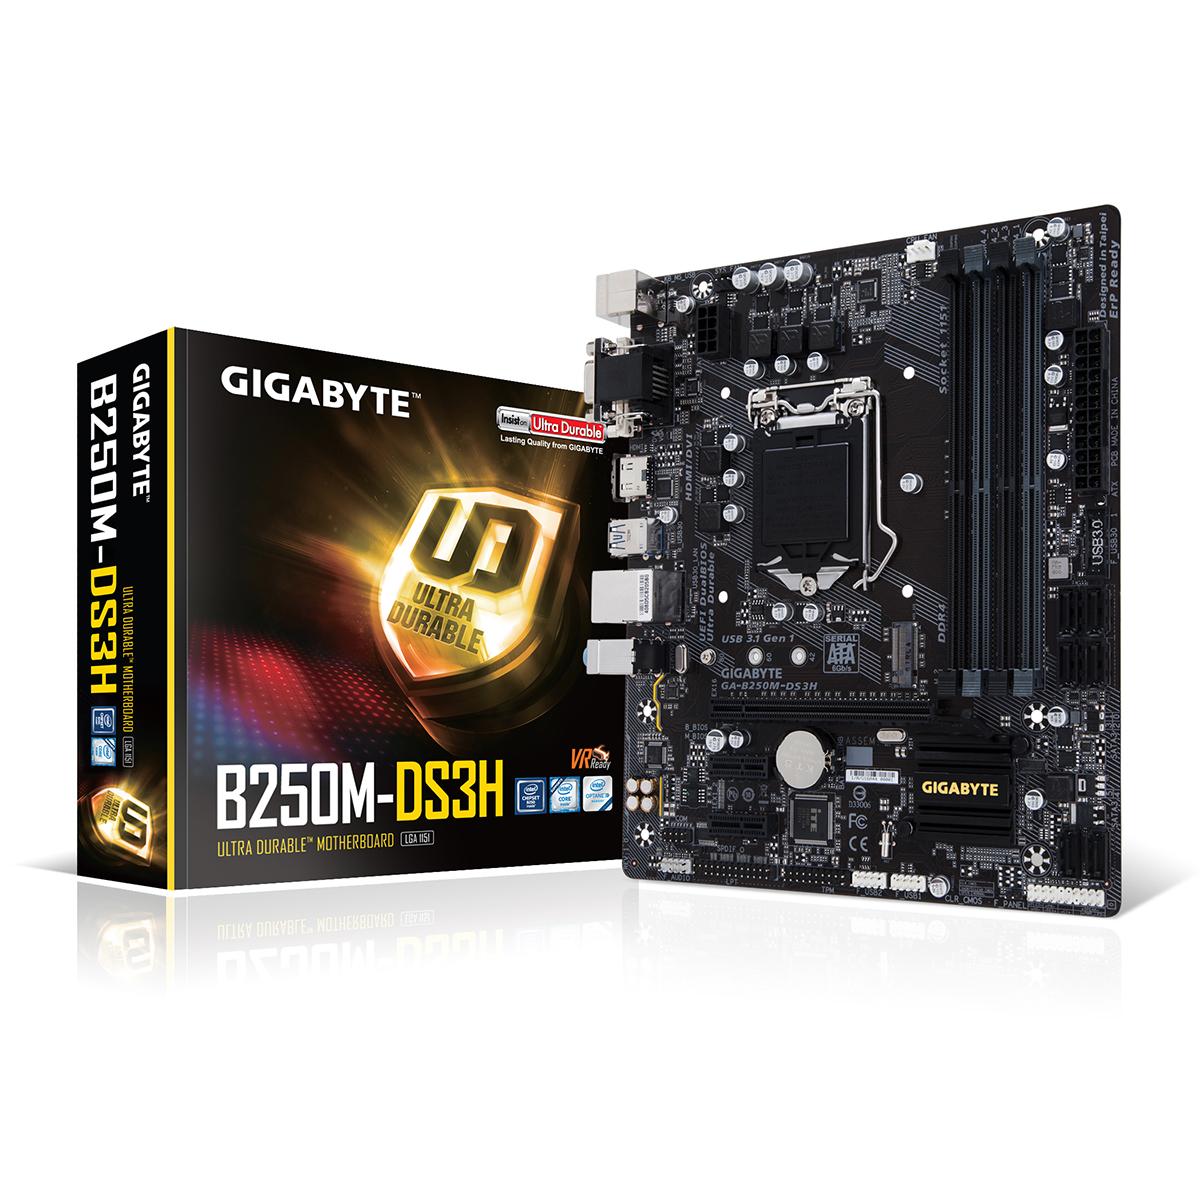 Carte mère Gigabyte GA-B250M-DS3H Carte mère Micro ATX Socket 1151 Intel B250 Express - 4x DDR4 - SATA 6Gb/s + M.2 - USB 3.0 - 1x PCI-Express 3.0 16x